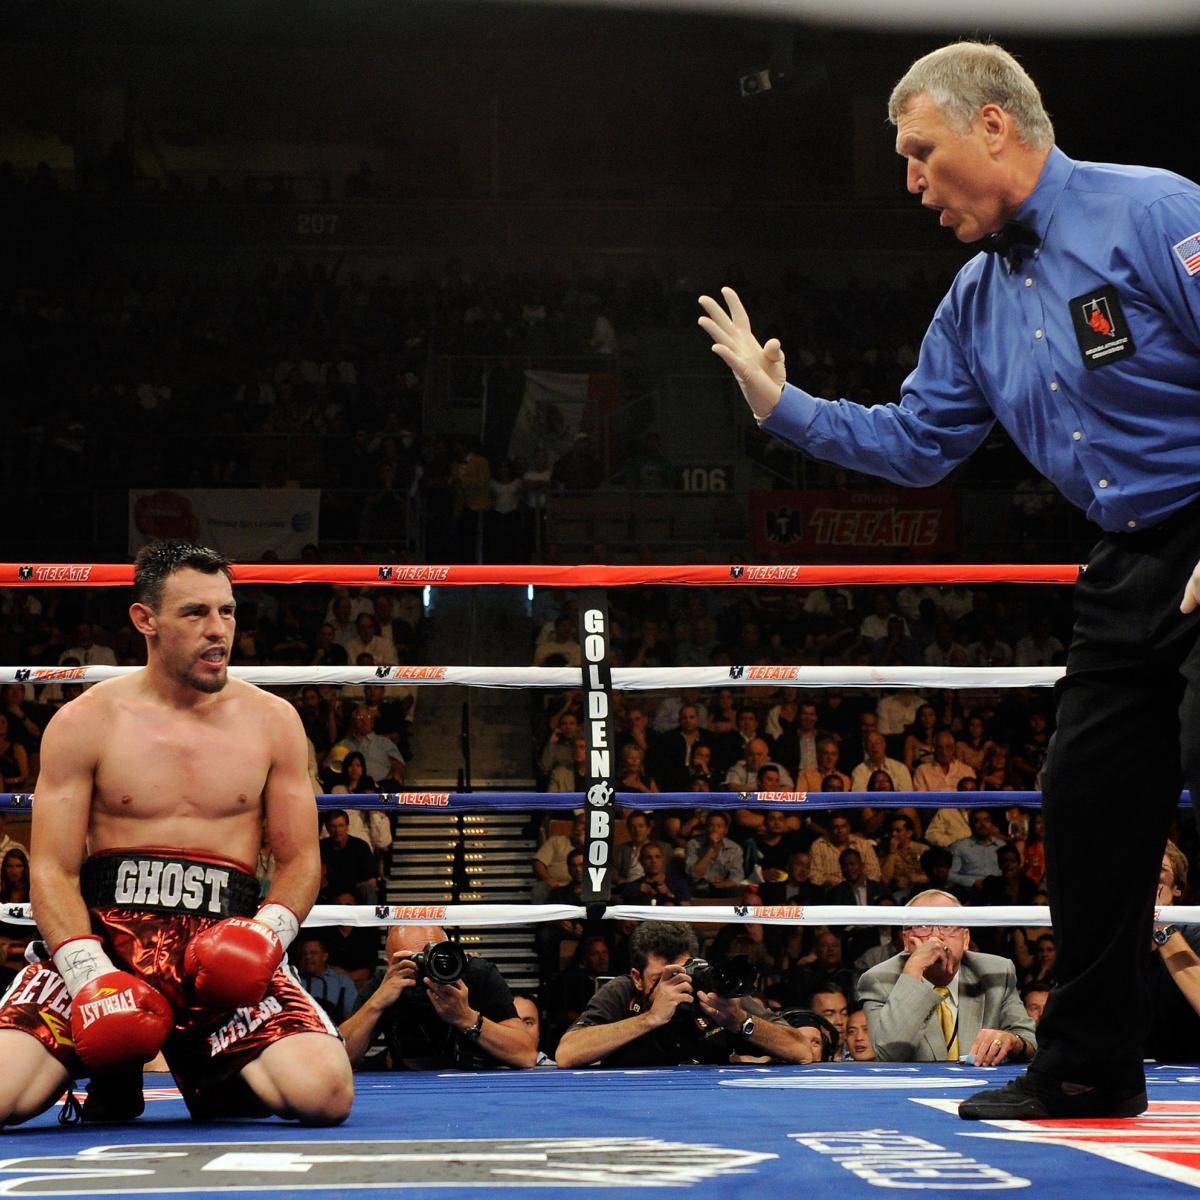 брейк в боксе картинка